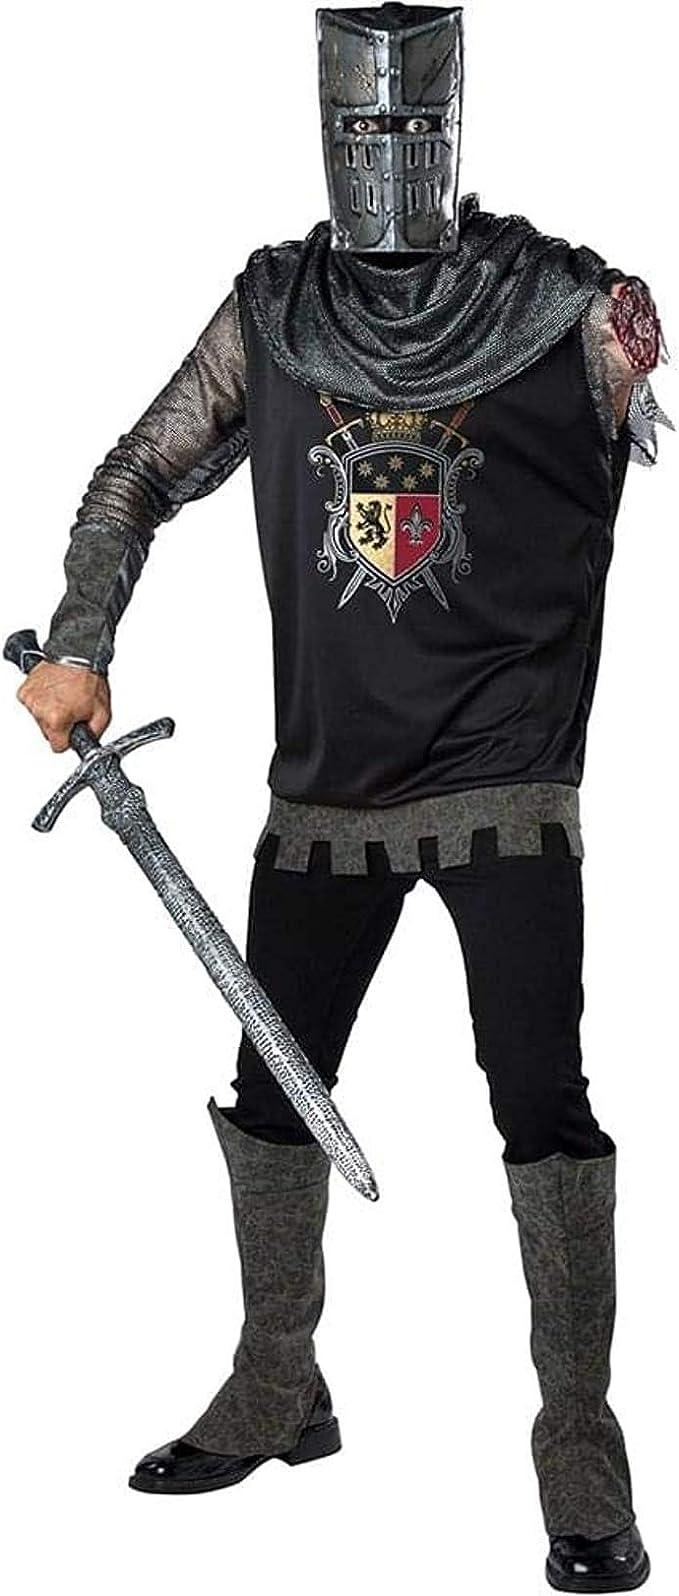 Dark Medieval Knight Adult Men/'s Costume Tunic Halloween Dress Up InCharacter